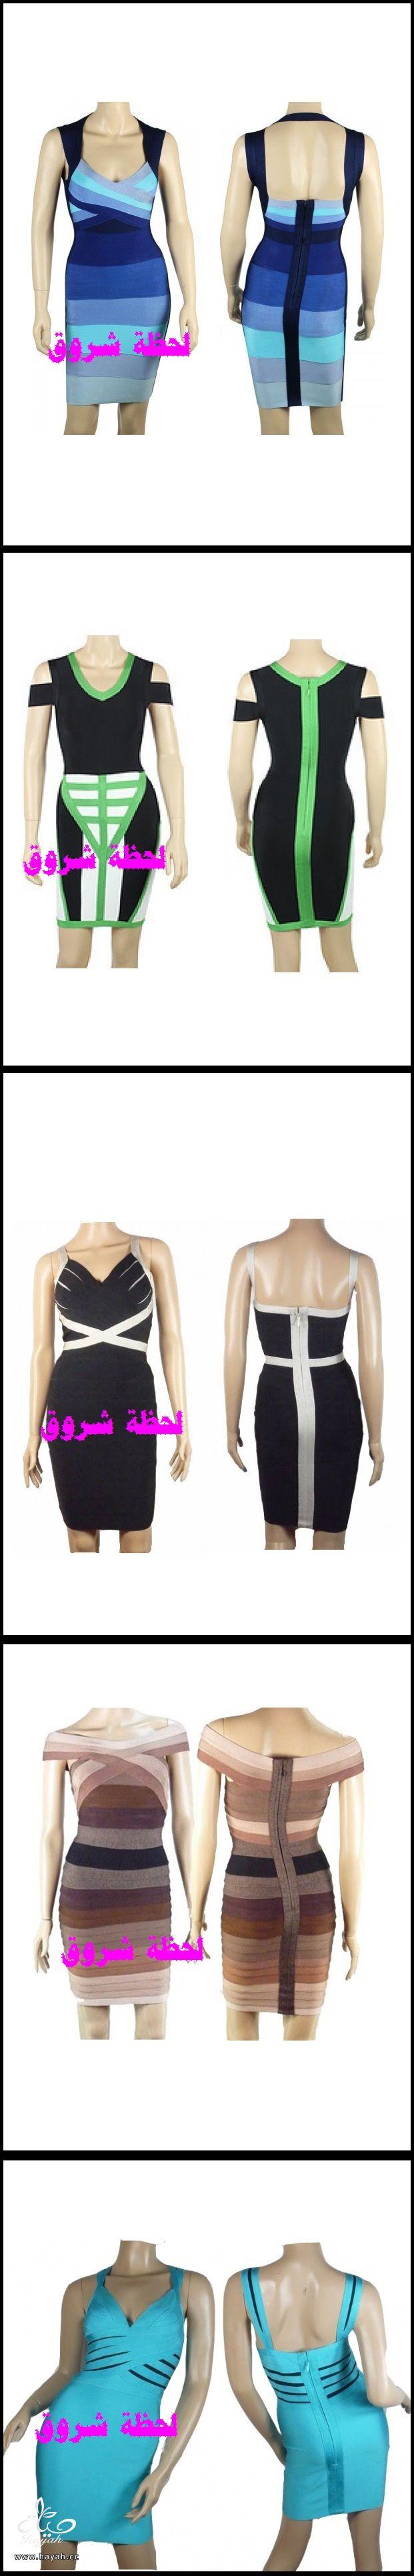 Dresses2015  2 hayahcc_1435965286_741.jpg